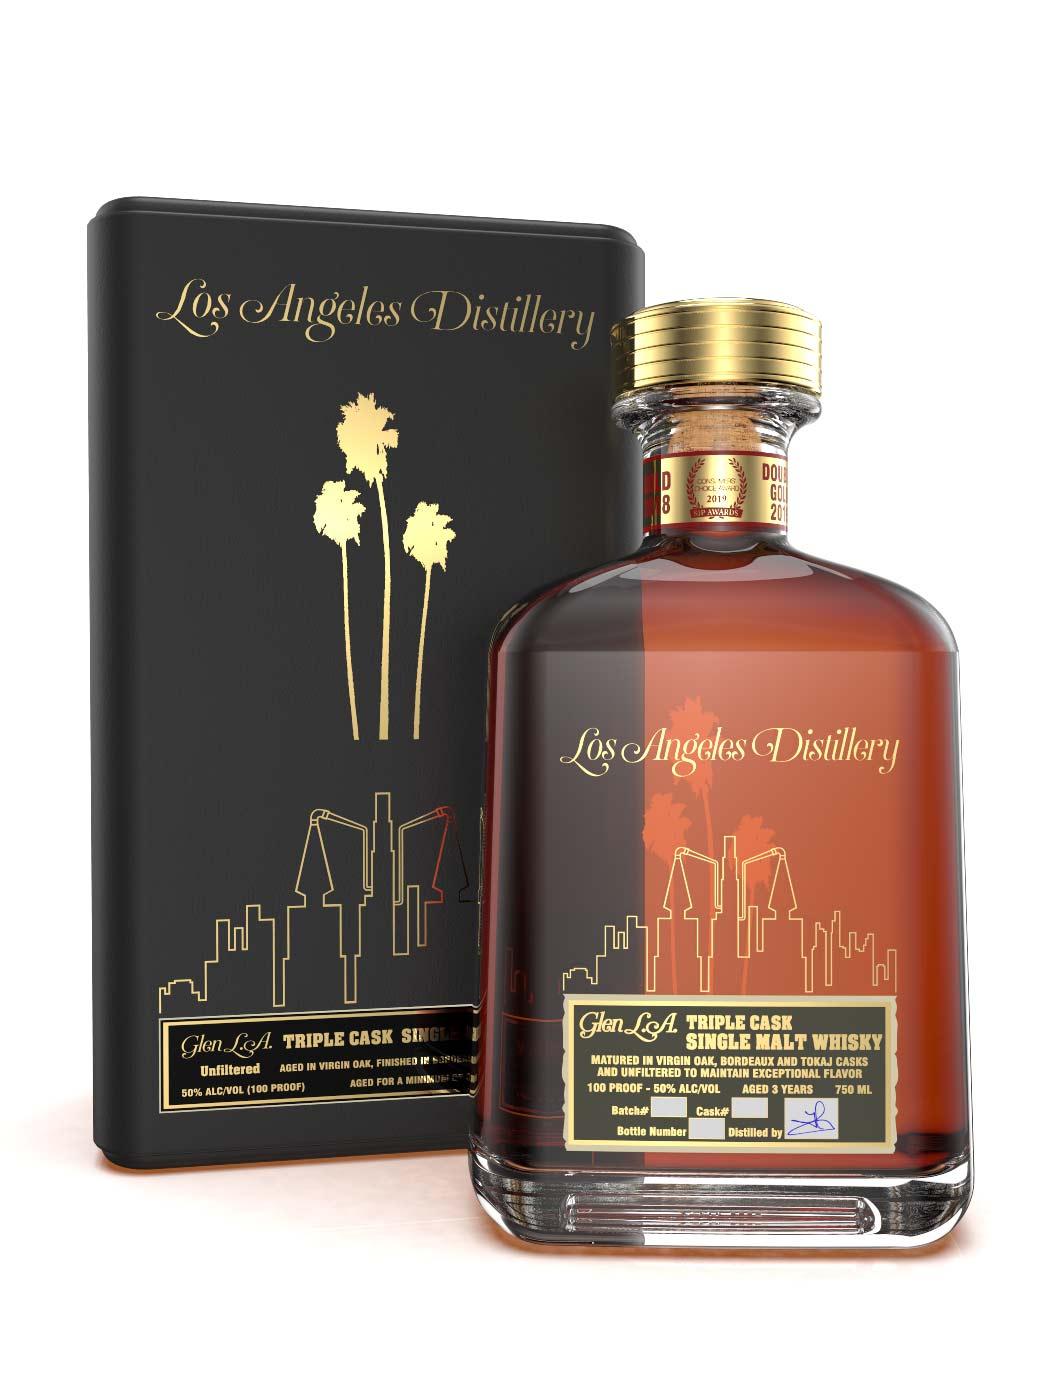 LA Distillery's Triple Cask Single Malt Whisky Collector's Edition